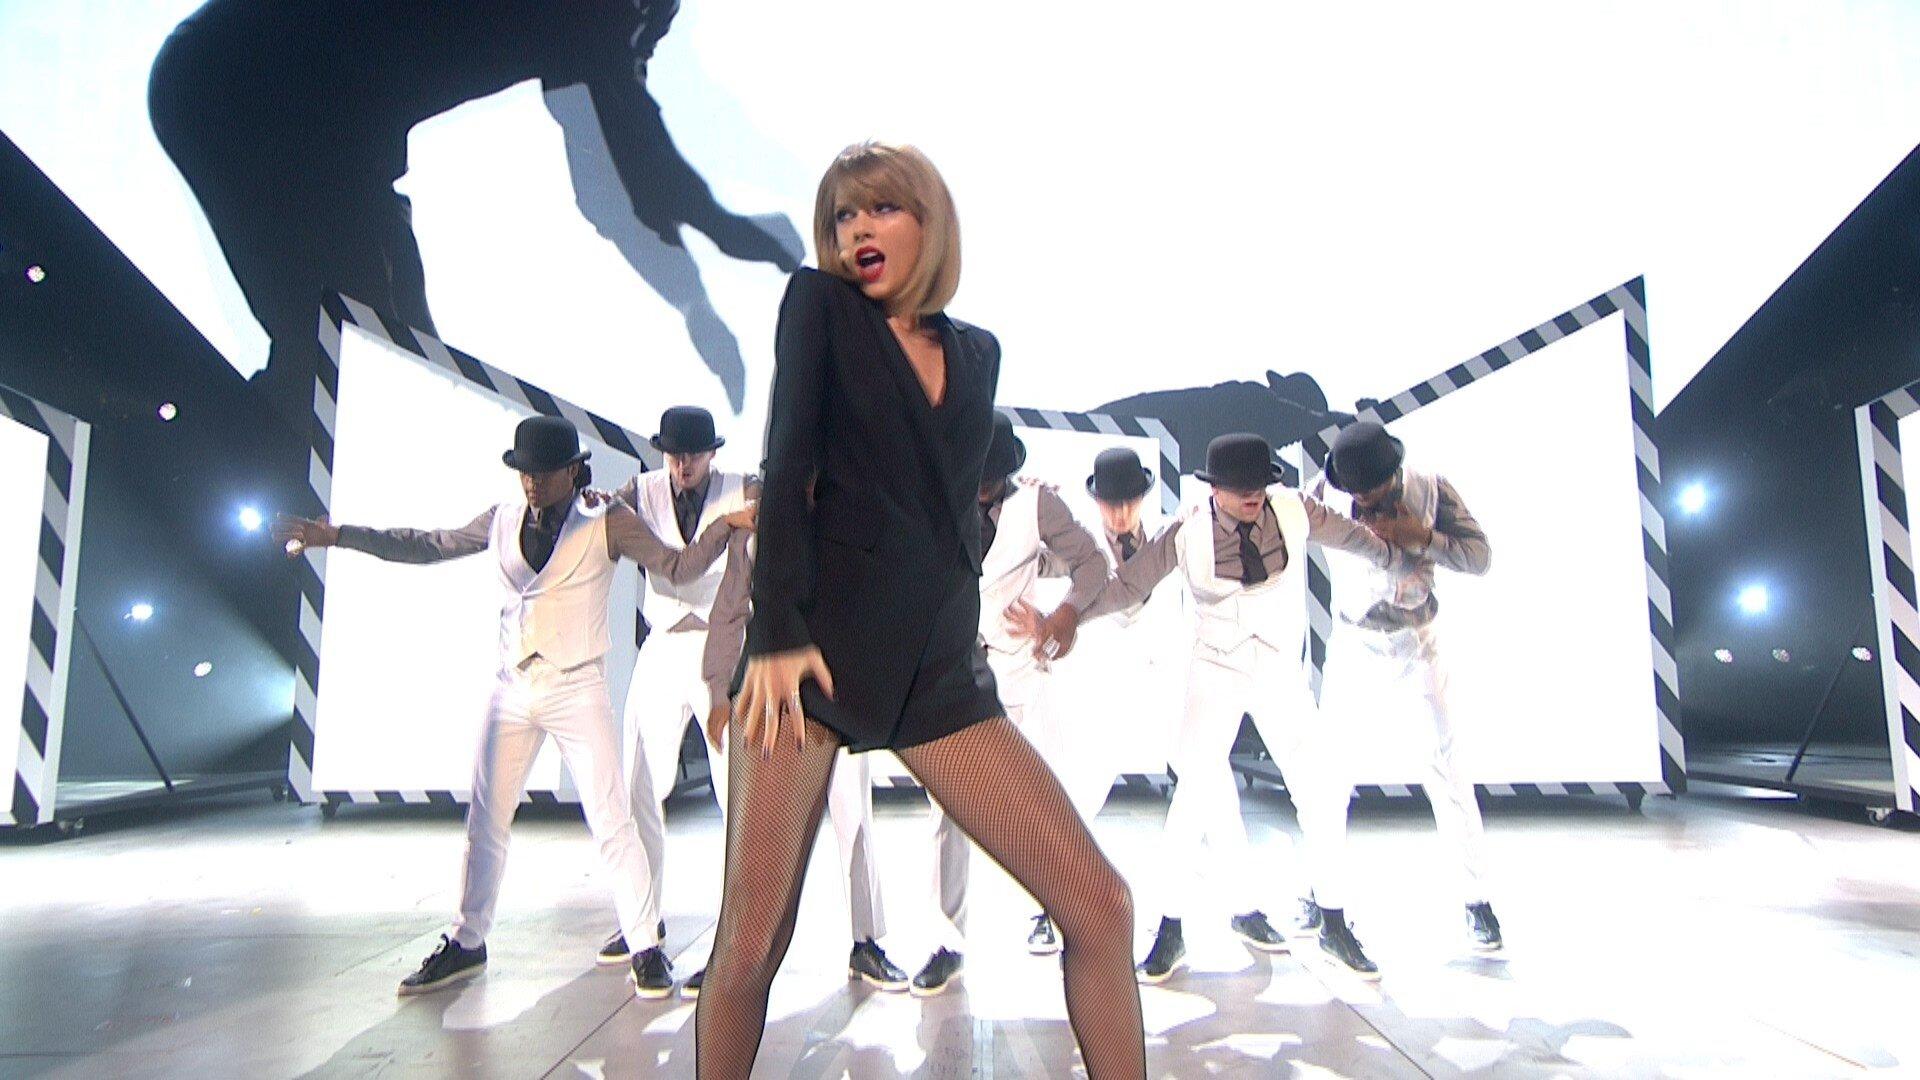 Taylor Swift - Blank Space - BRIT Awards 2015 1080i HDTV 45 Mbps MPA2.0 4-2-2 H..jpg